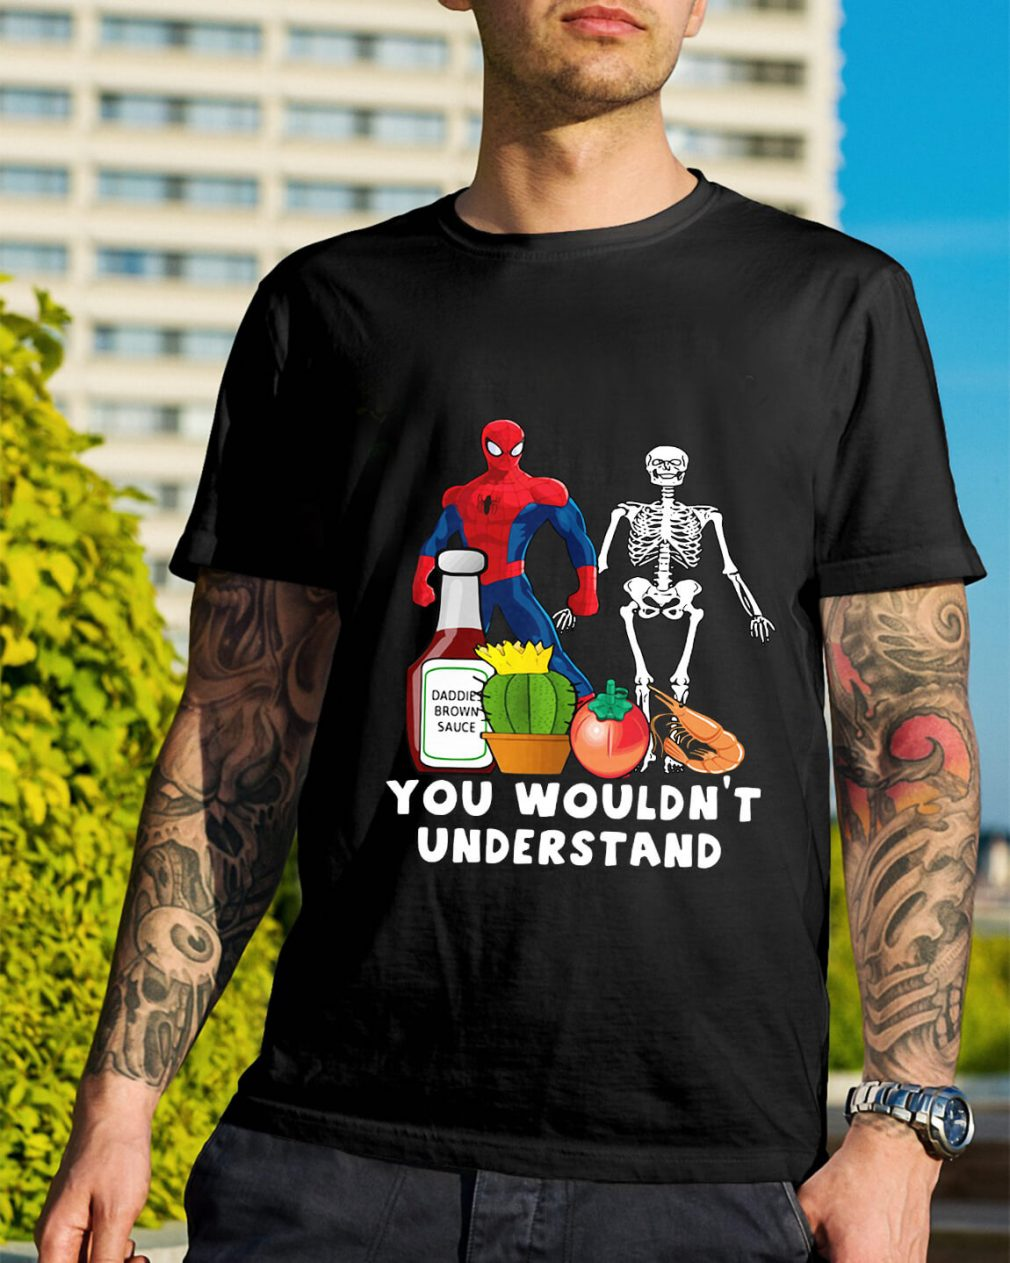 Spider Man and Skeleton daddie brown sauce shirt